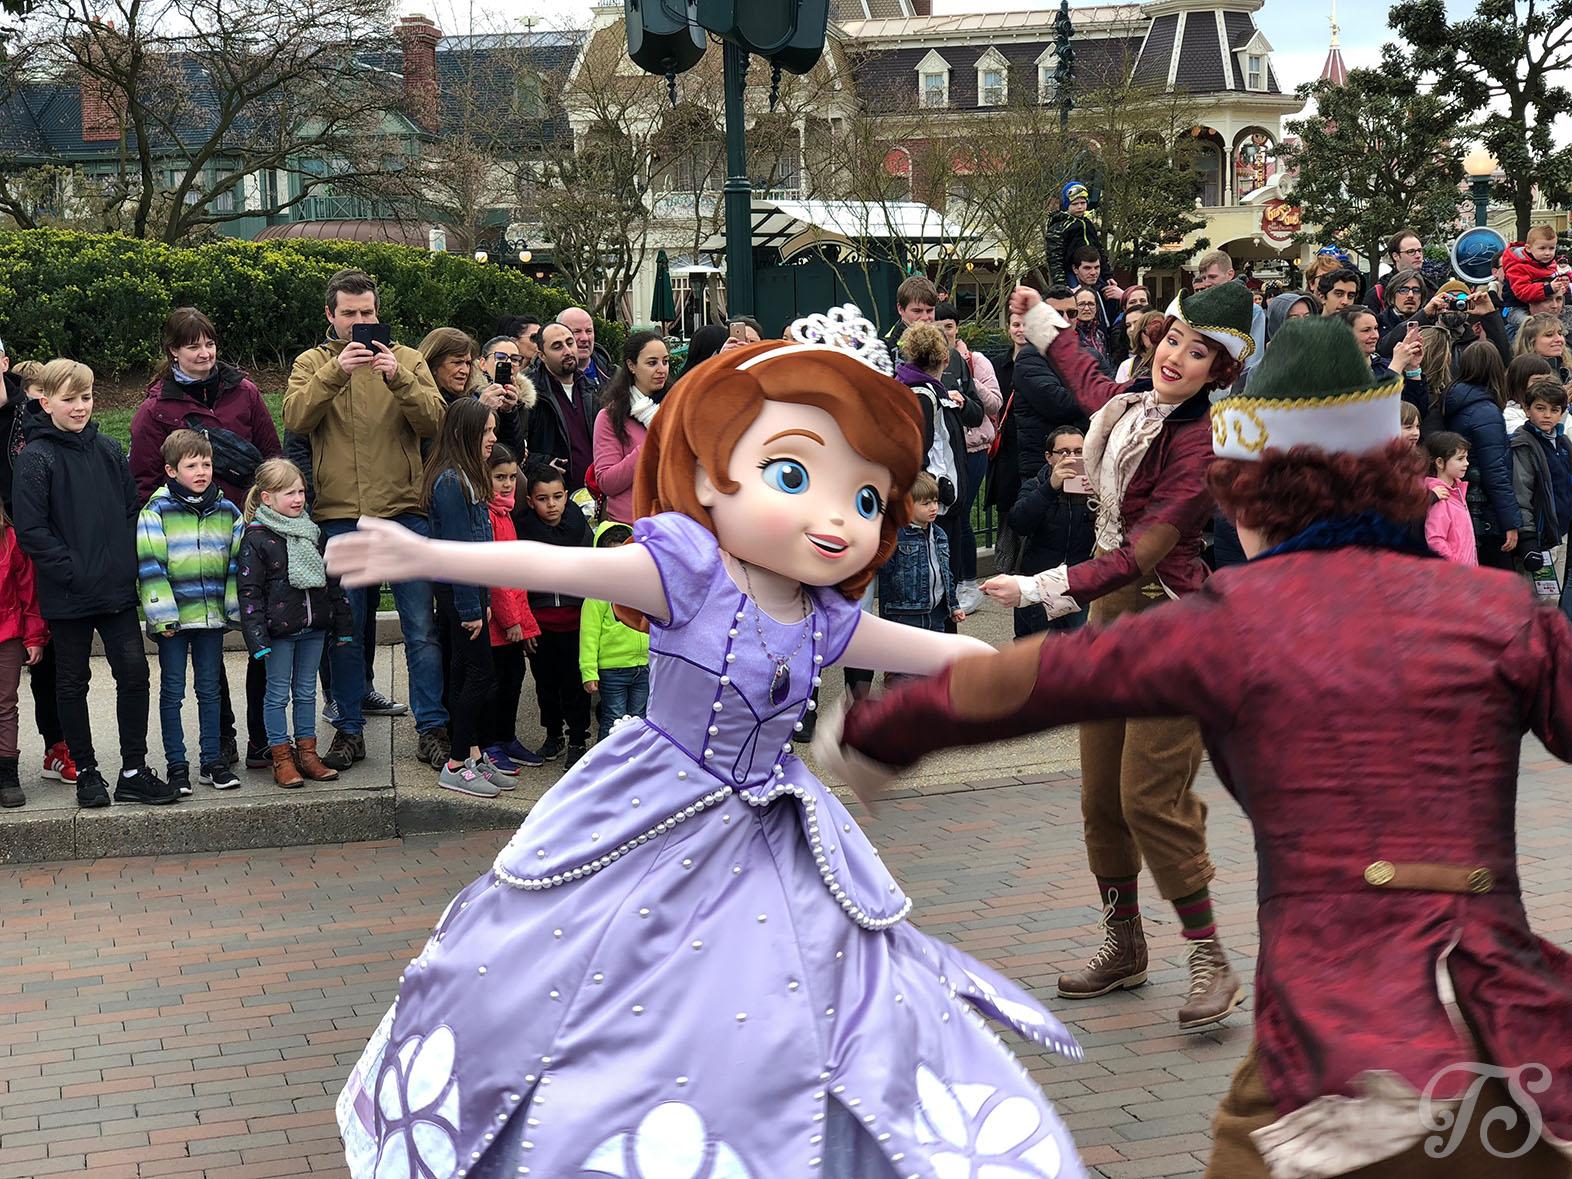 The Princess Promenade during the Festival of Pirates and Princesses at Disneyland Paris